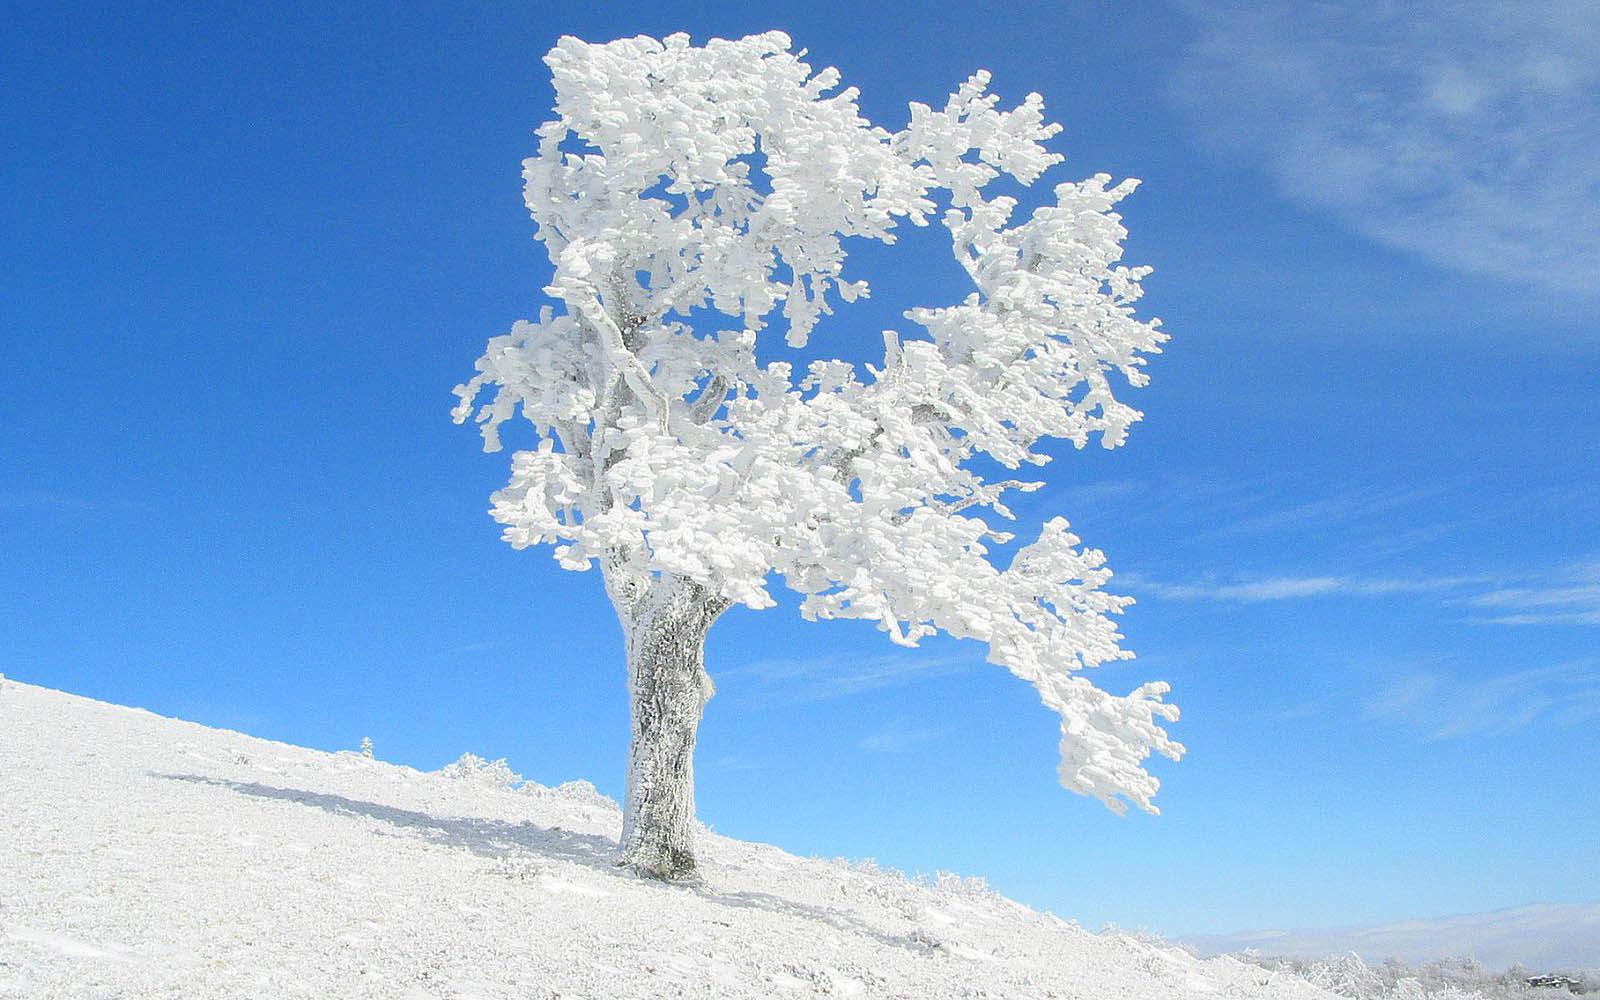 frozen trees widescreen wallpaper - photo #4